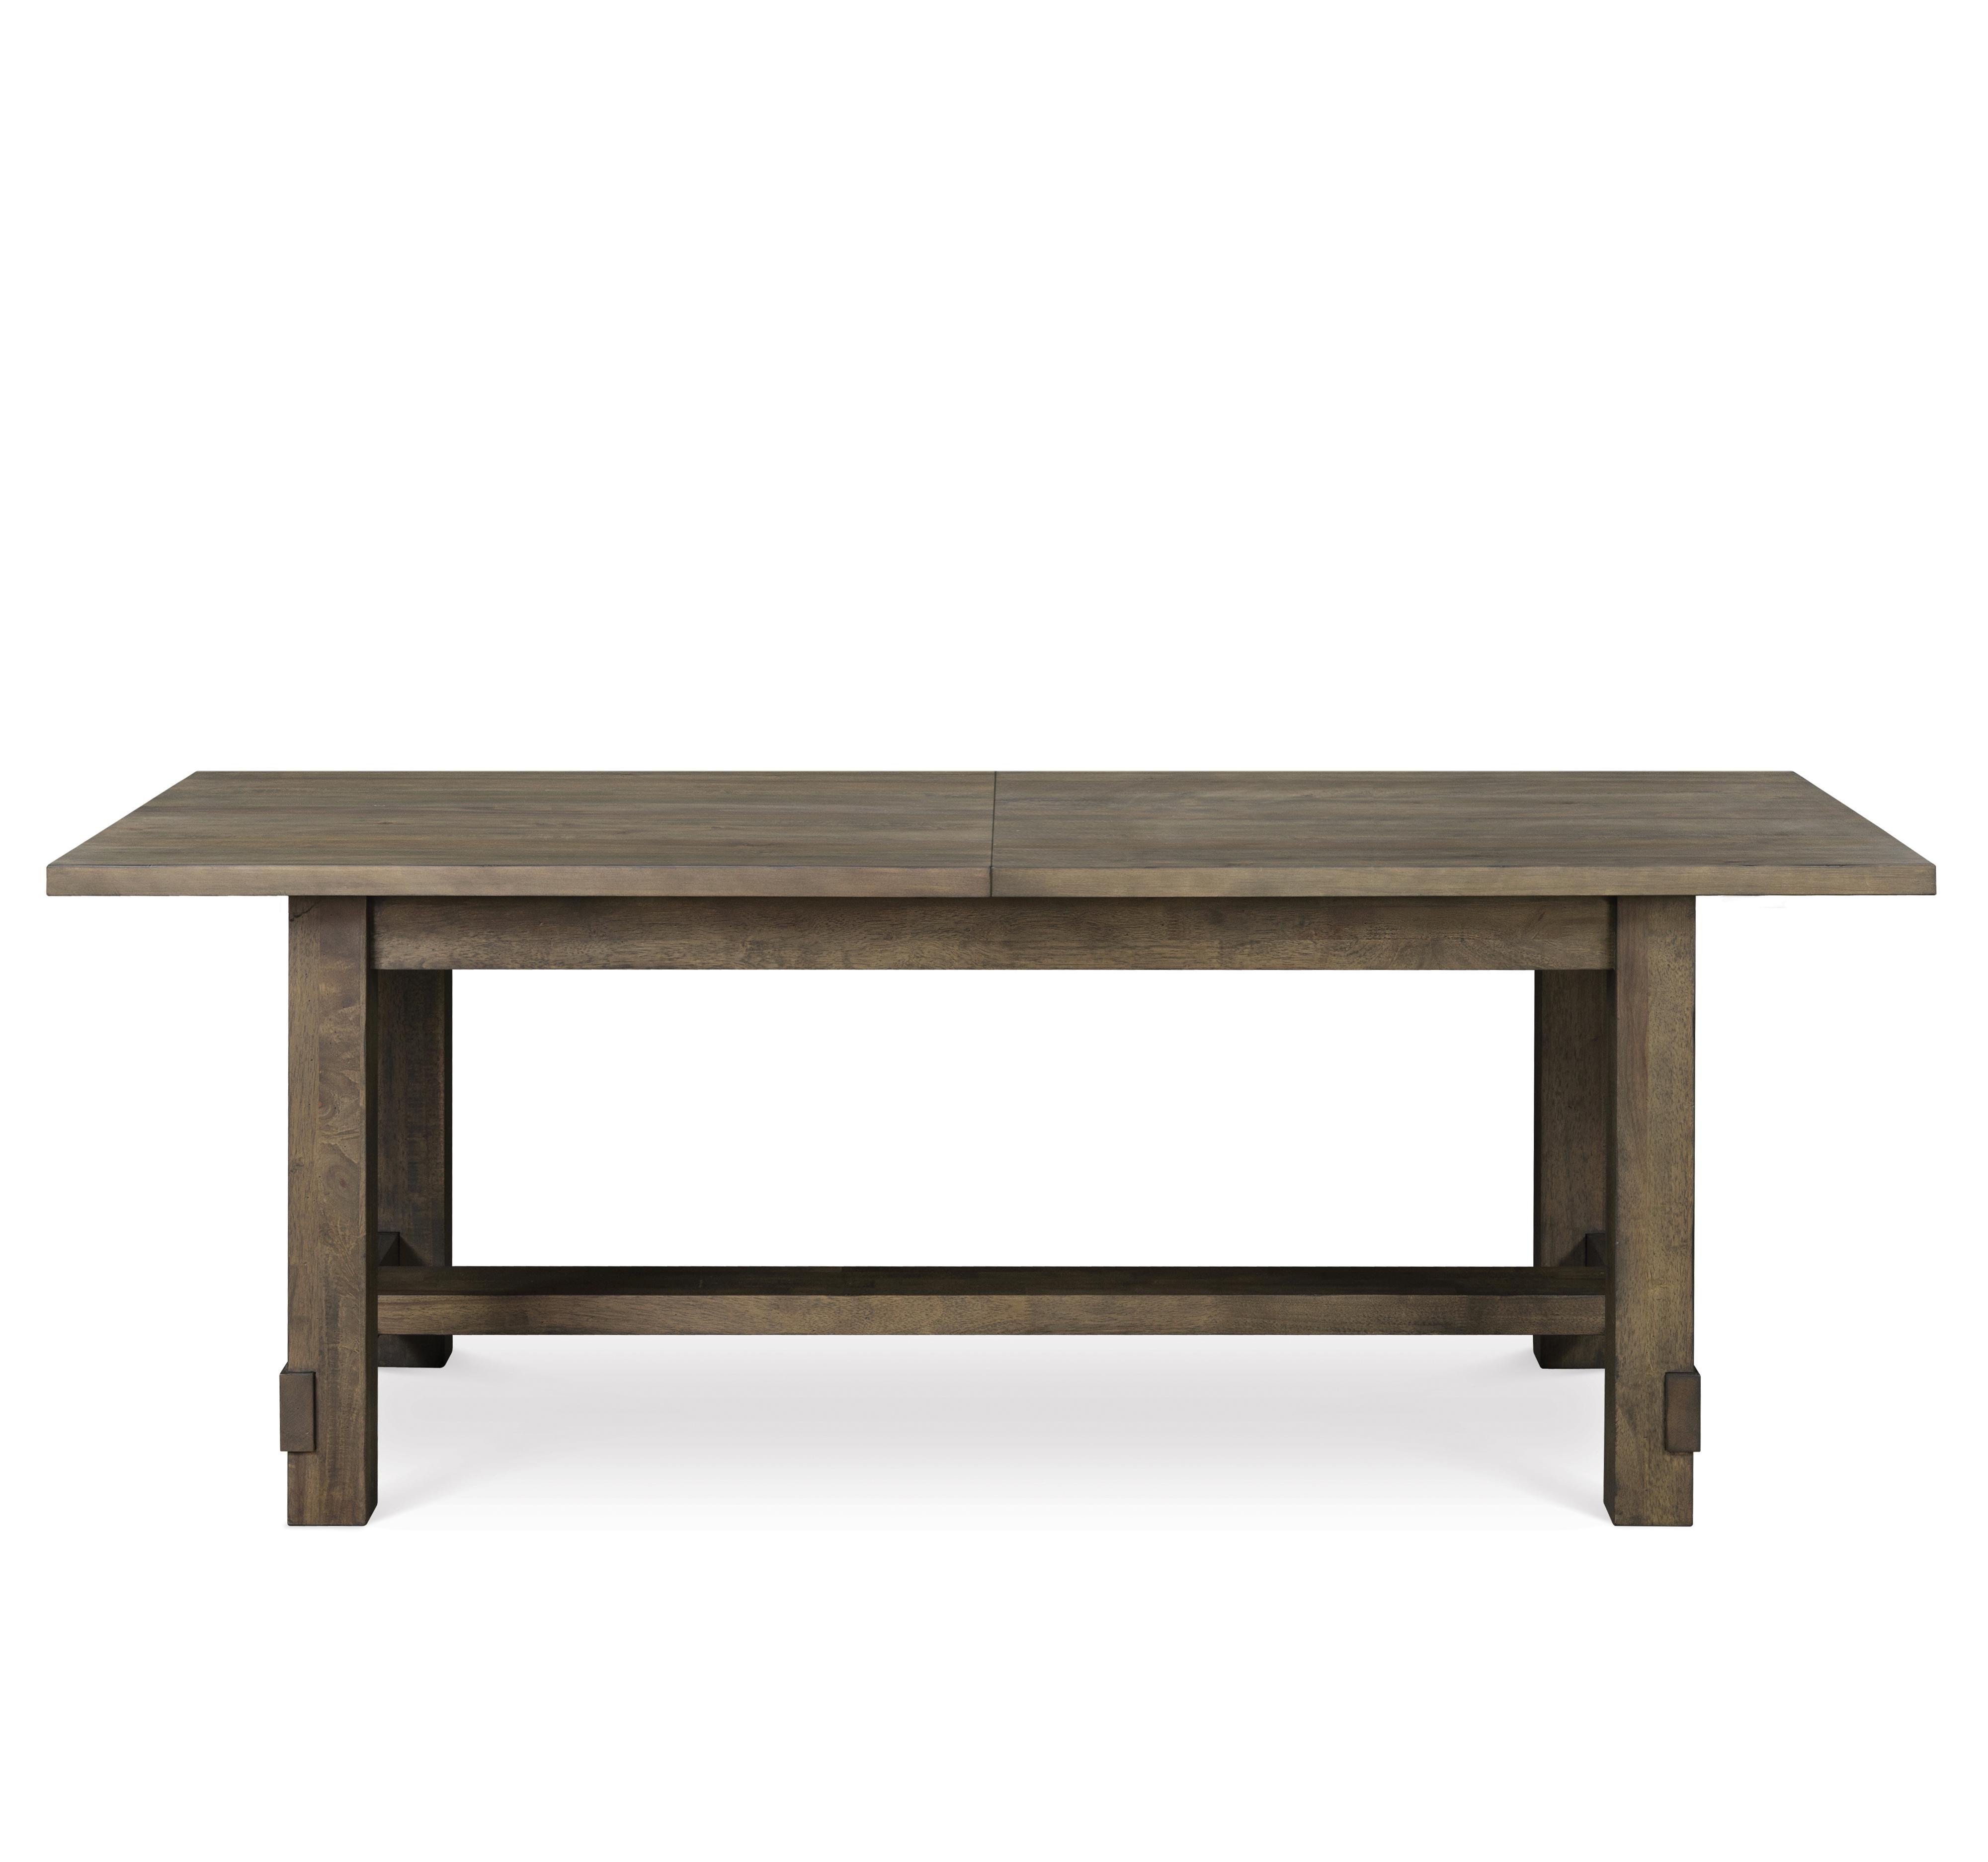 Magnussen Home Karlin Rectangular Dining Table - Item Number: D2471-20